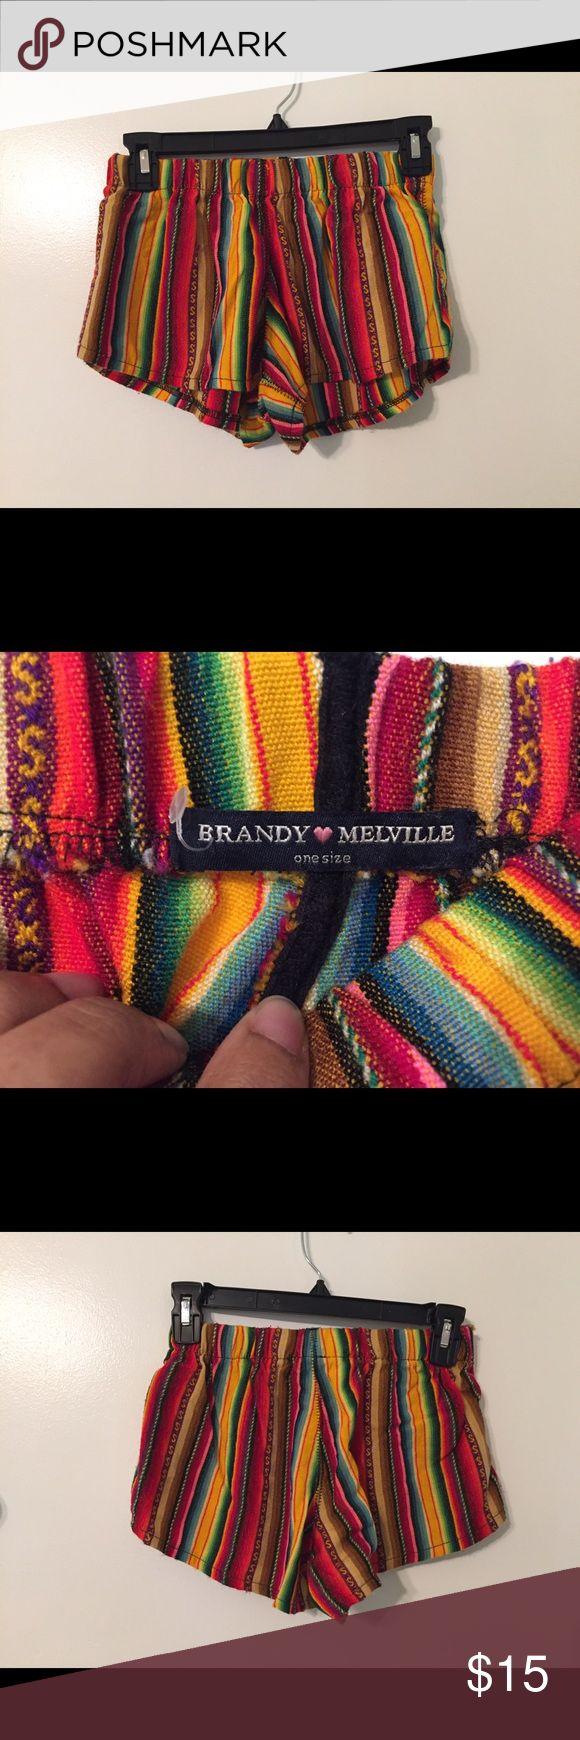 Brandy Melville tribal shorts Brandy Melville tribal shorts one size fits small / medium Brandy Melville Shorts